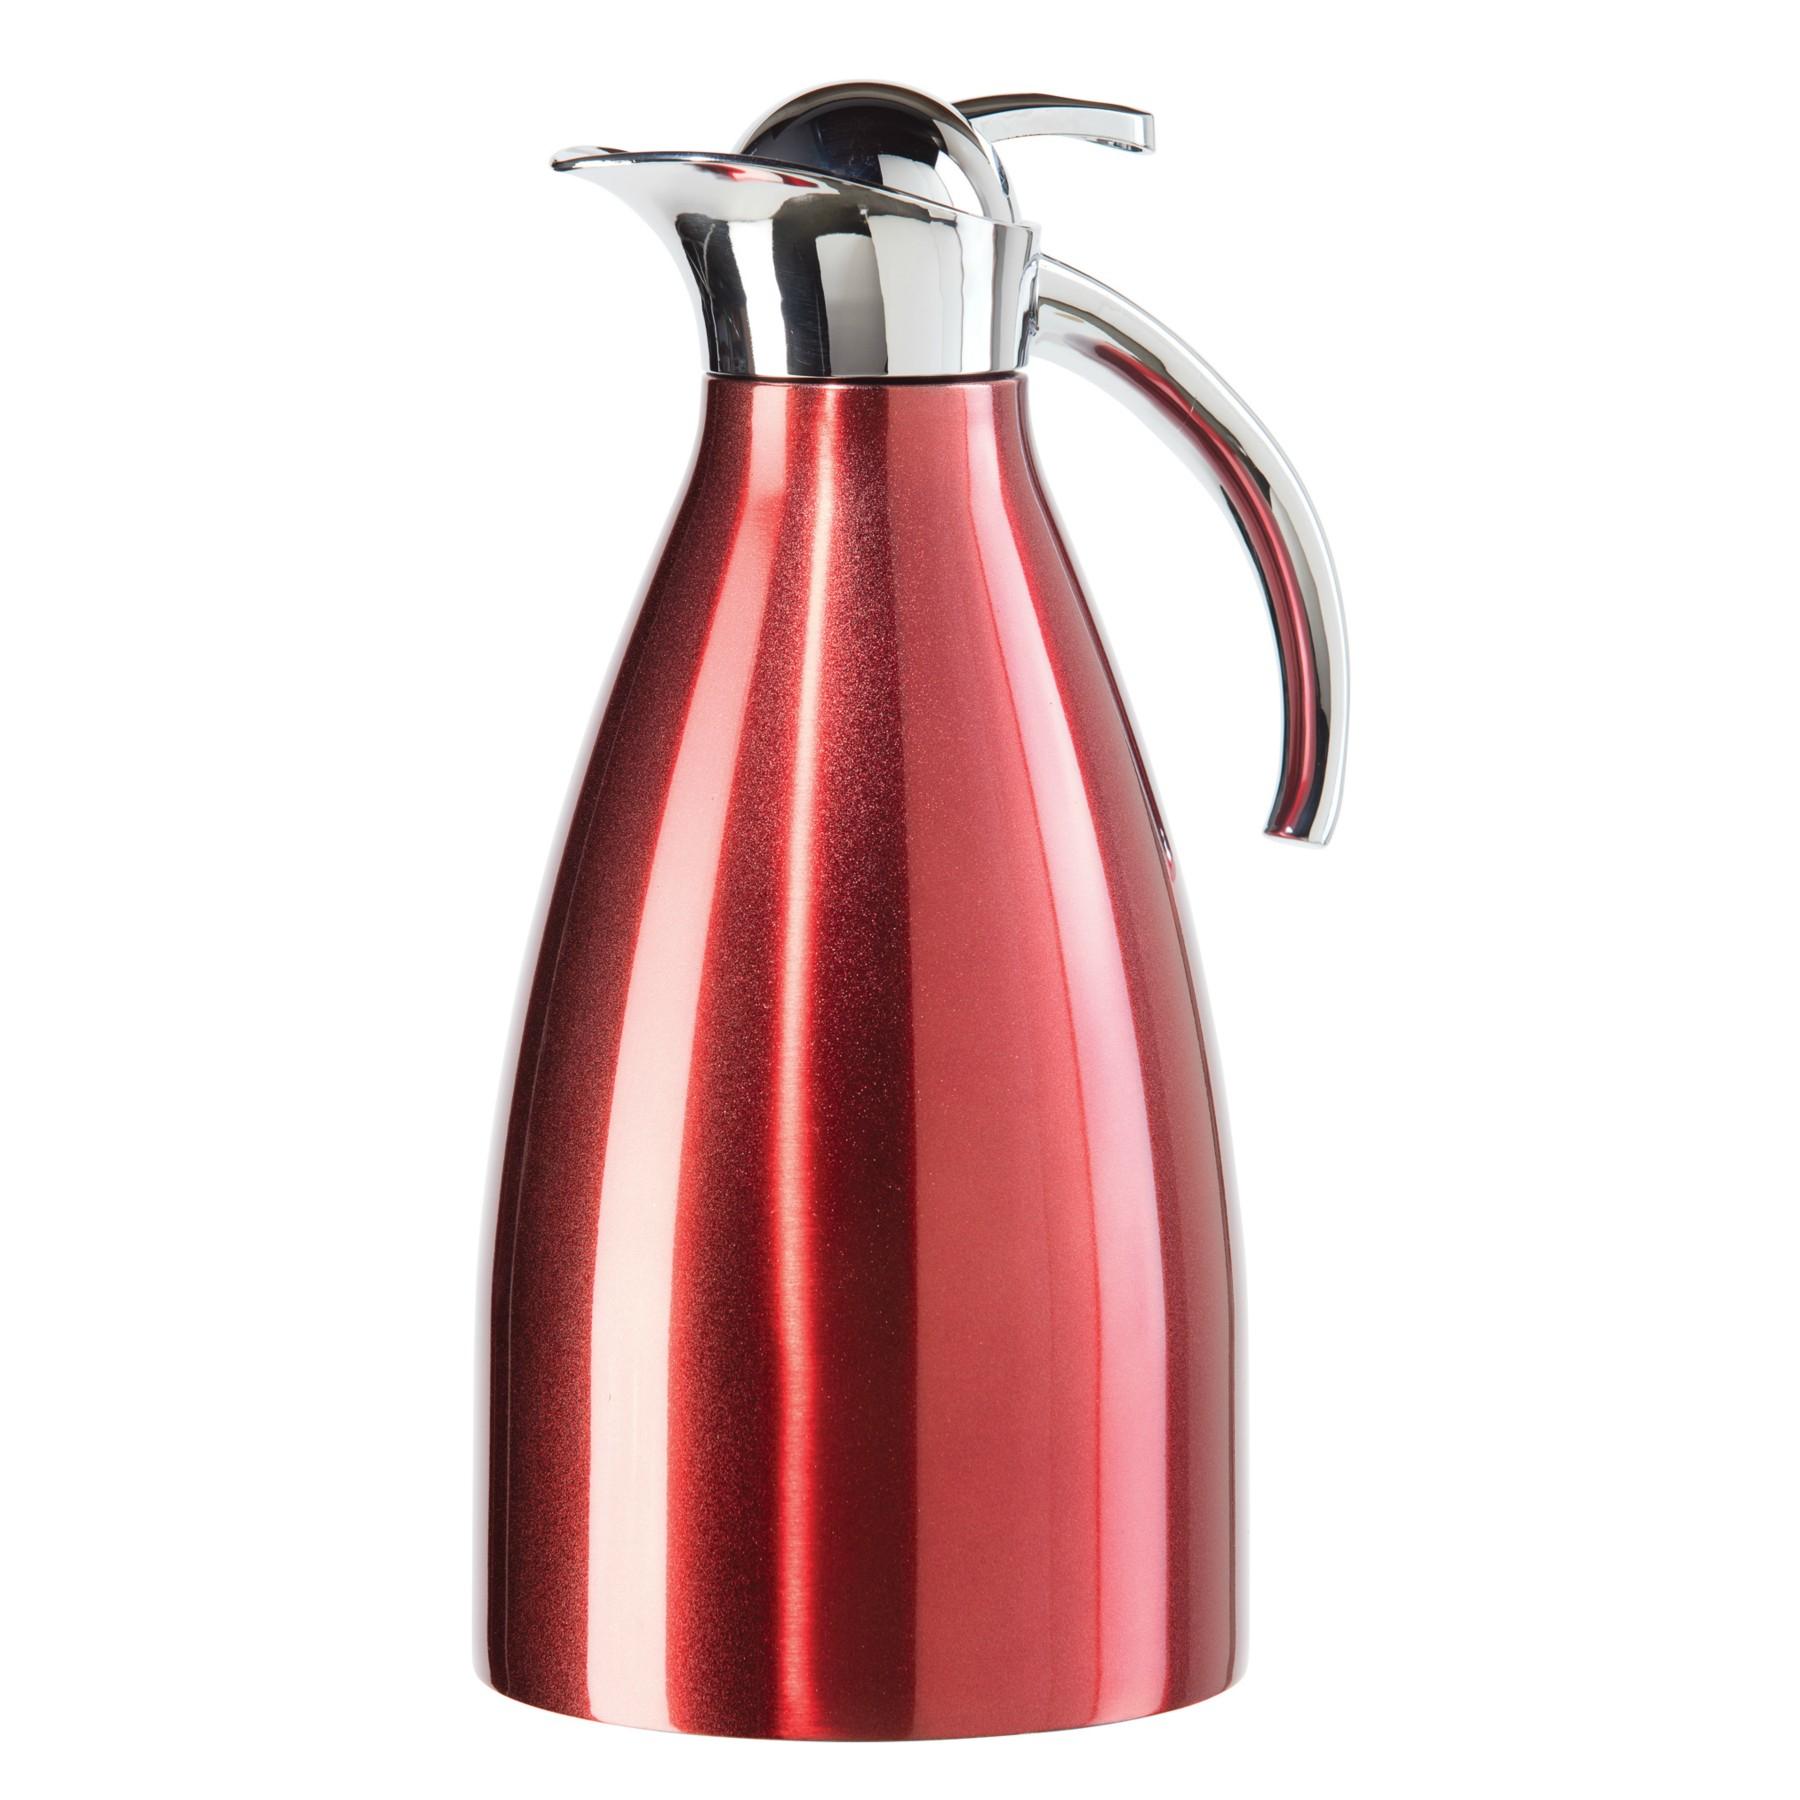 Oggi Allegra Red Stainless Steel Carafe